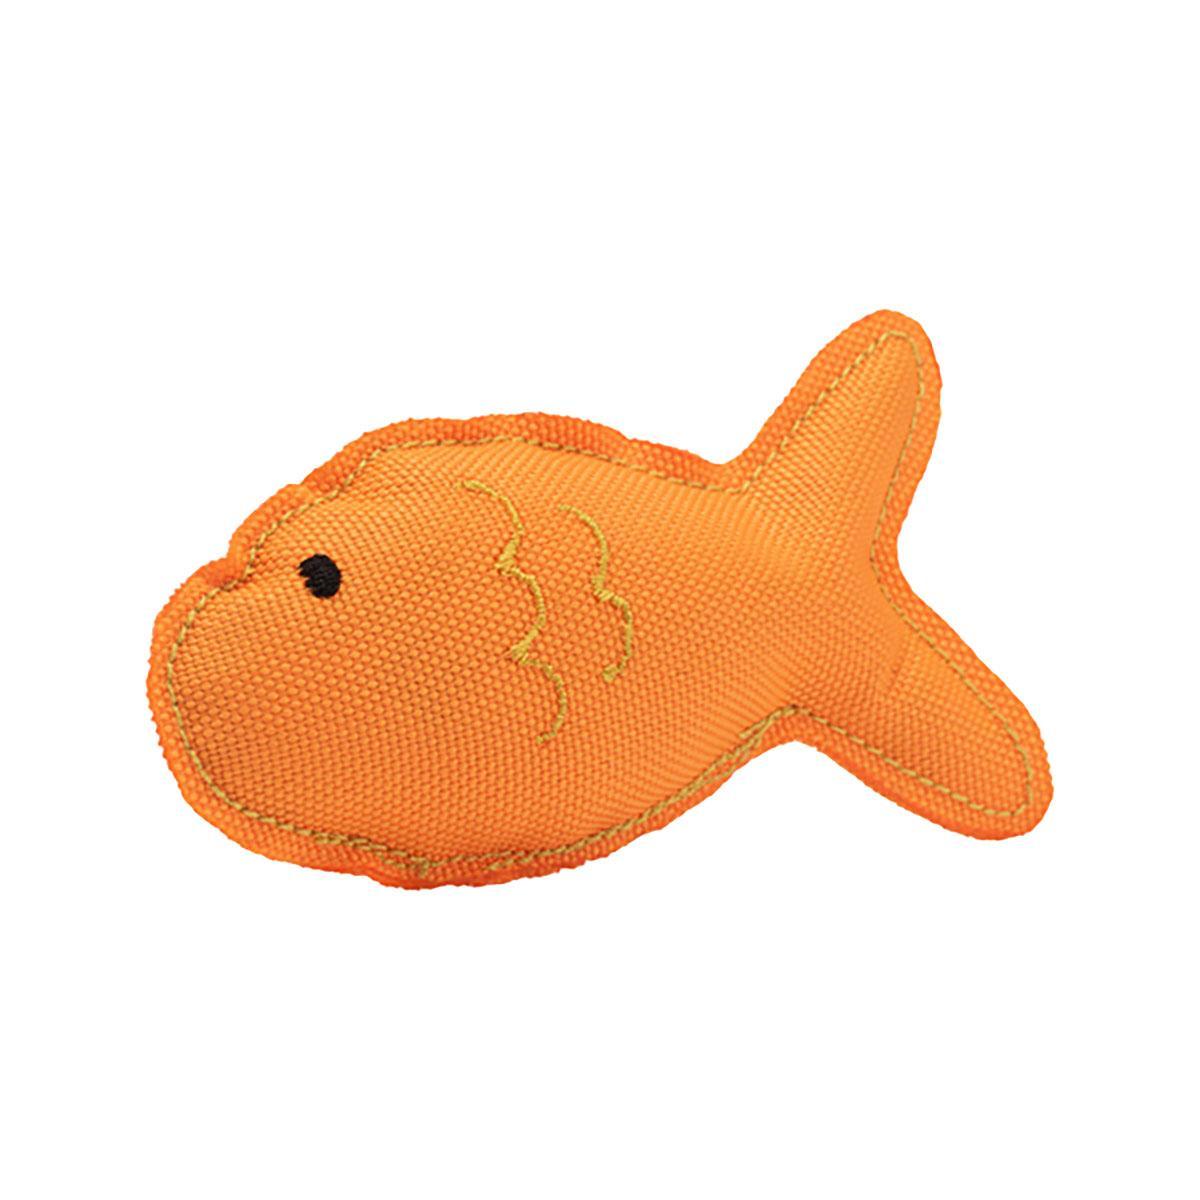 BECO Recycled Plastic Catnip Cat Toy - Fish